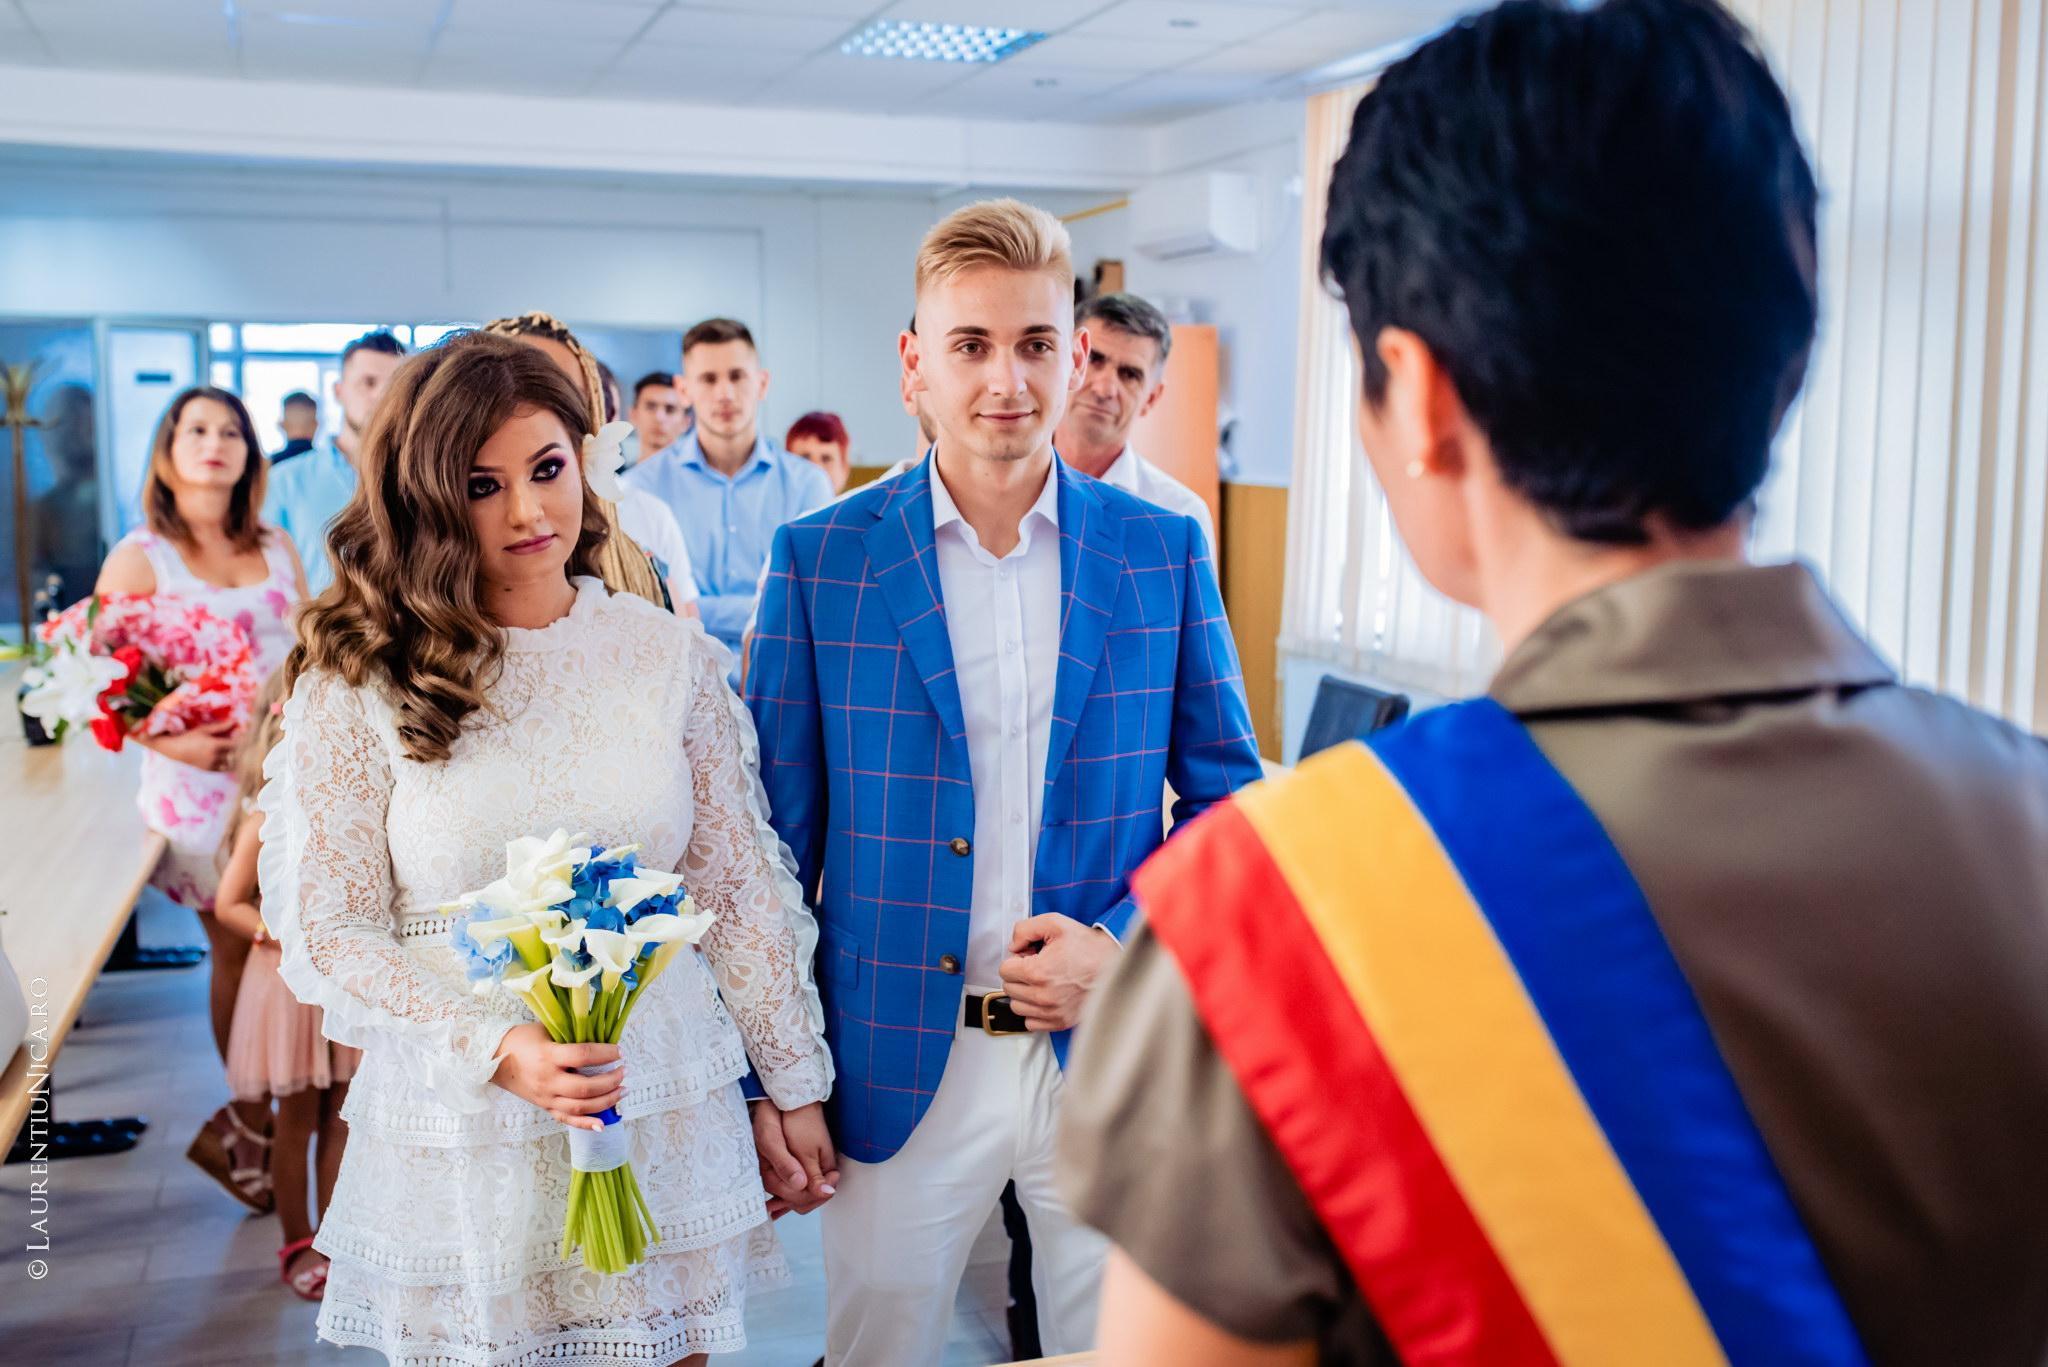 fotografii nunta Roxana si Cosmin fotograf nunta laurentiu nica 01 - Roxana & Cosmin | Fotografii nunta | Ticleni, judetul Gorj